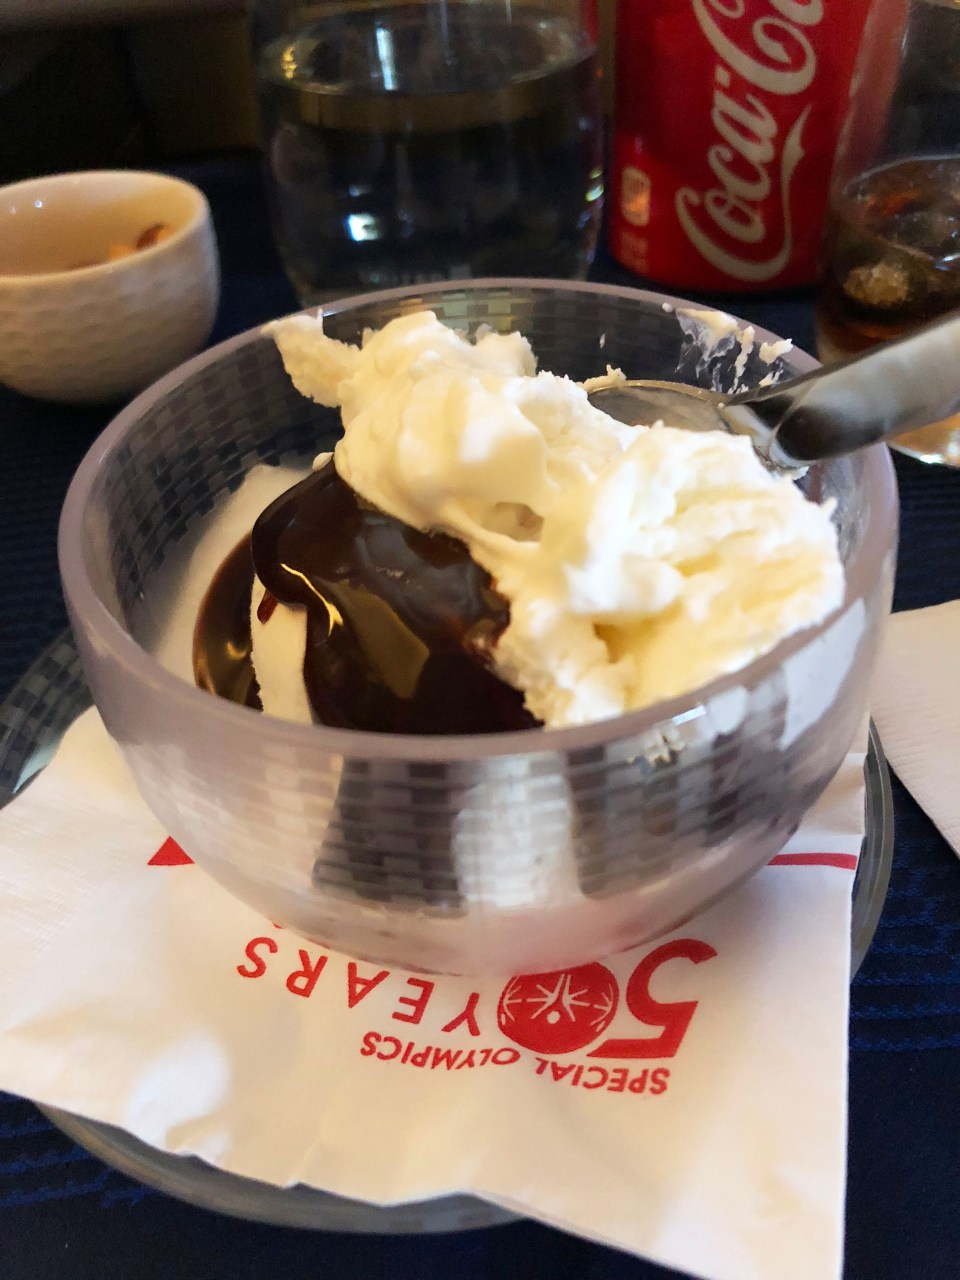 Airplane icecream sundae